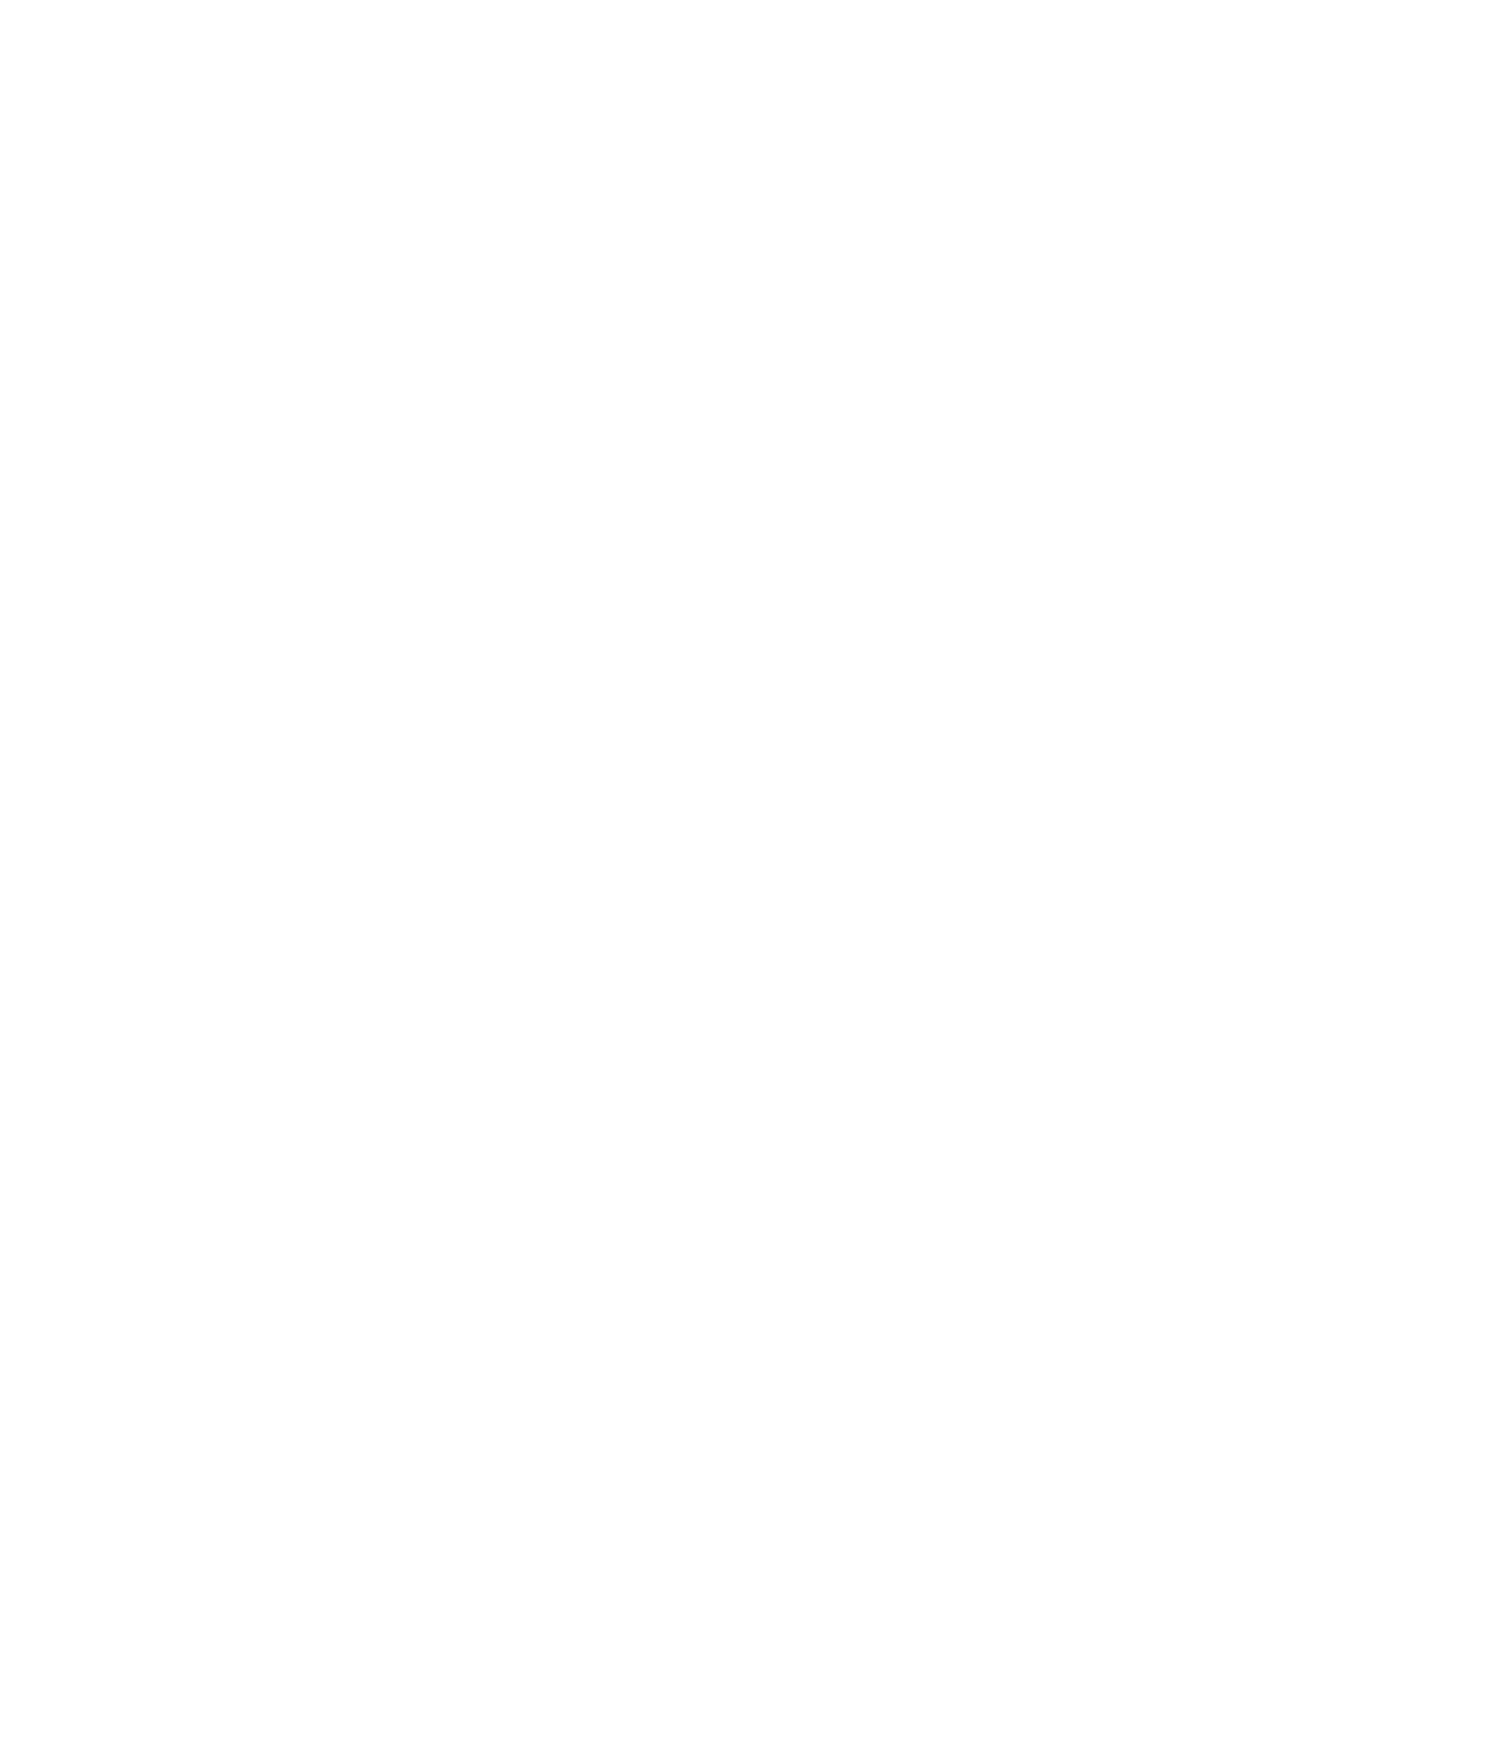 Máscara de imagen de cooperación internacional